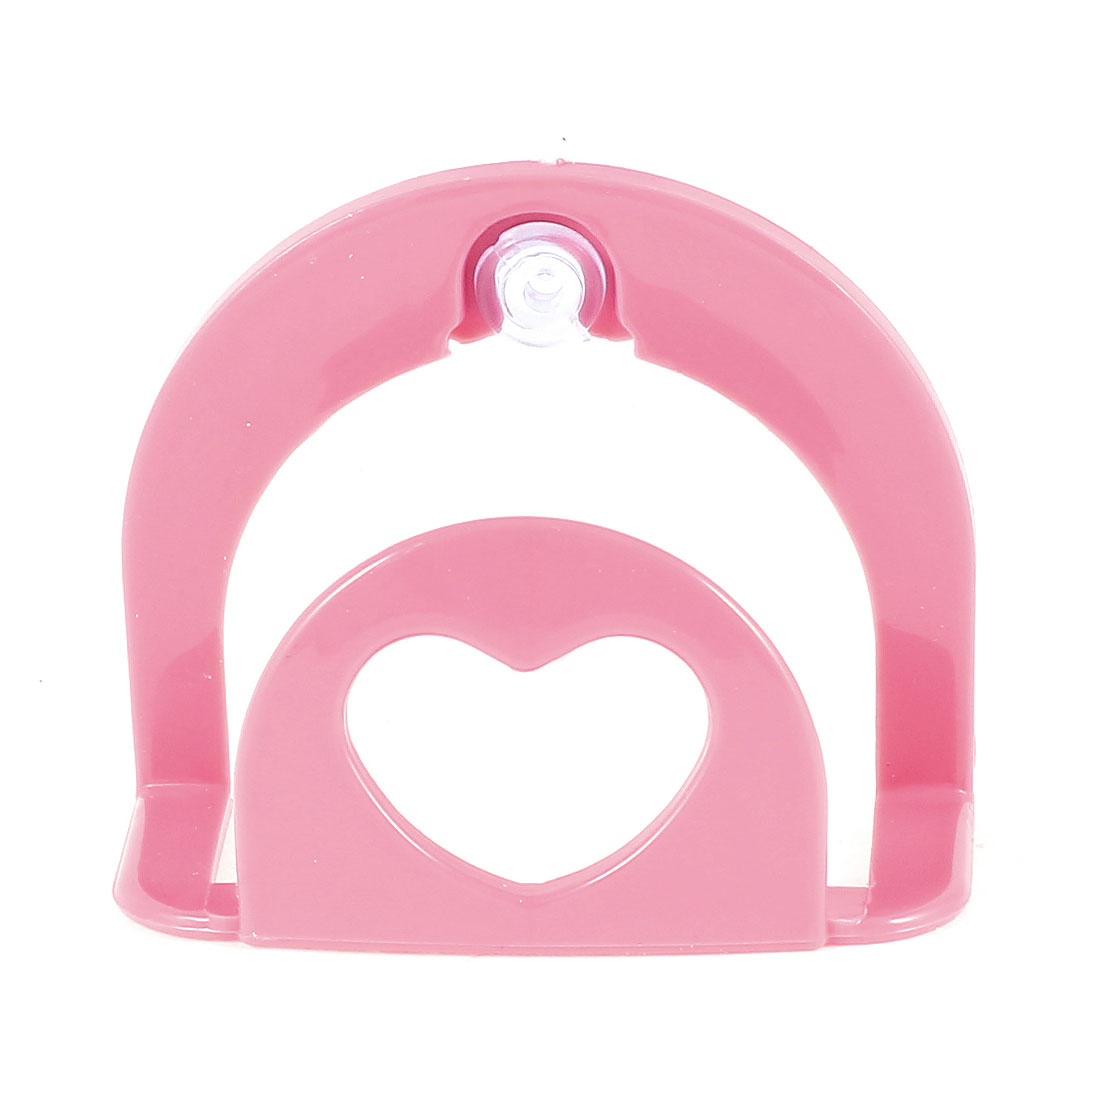 Home Bathroom Pink Plastic Wall Mounted Suction Up Sponge Holder Bracket